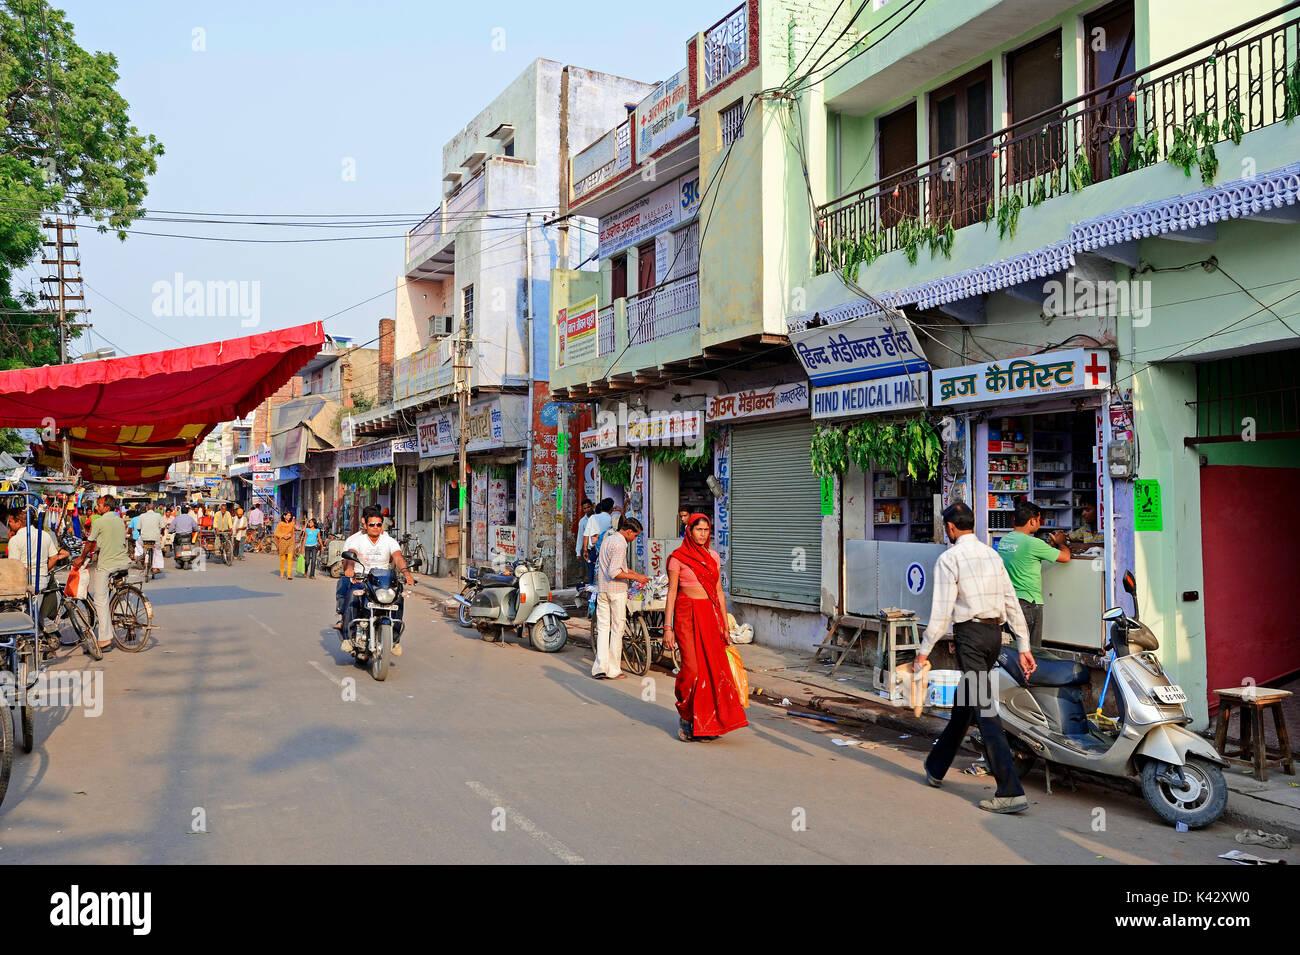 Shopping street, Bharatpur, Rajasthan, India | Einkaufsstrasse, Bharatpur, Rajasthan, Indien - Stock Image